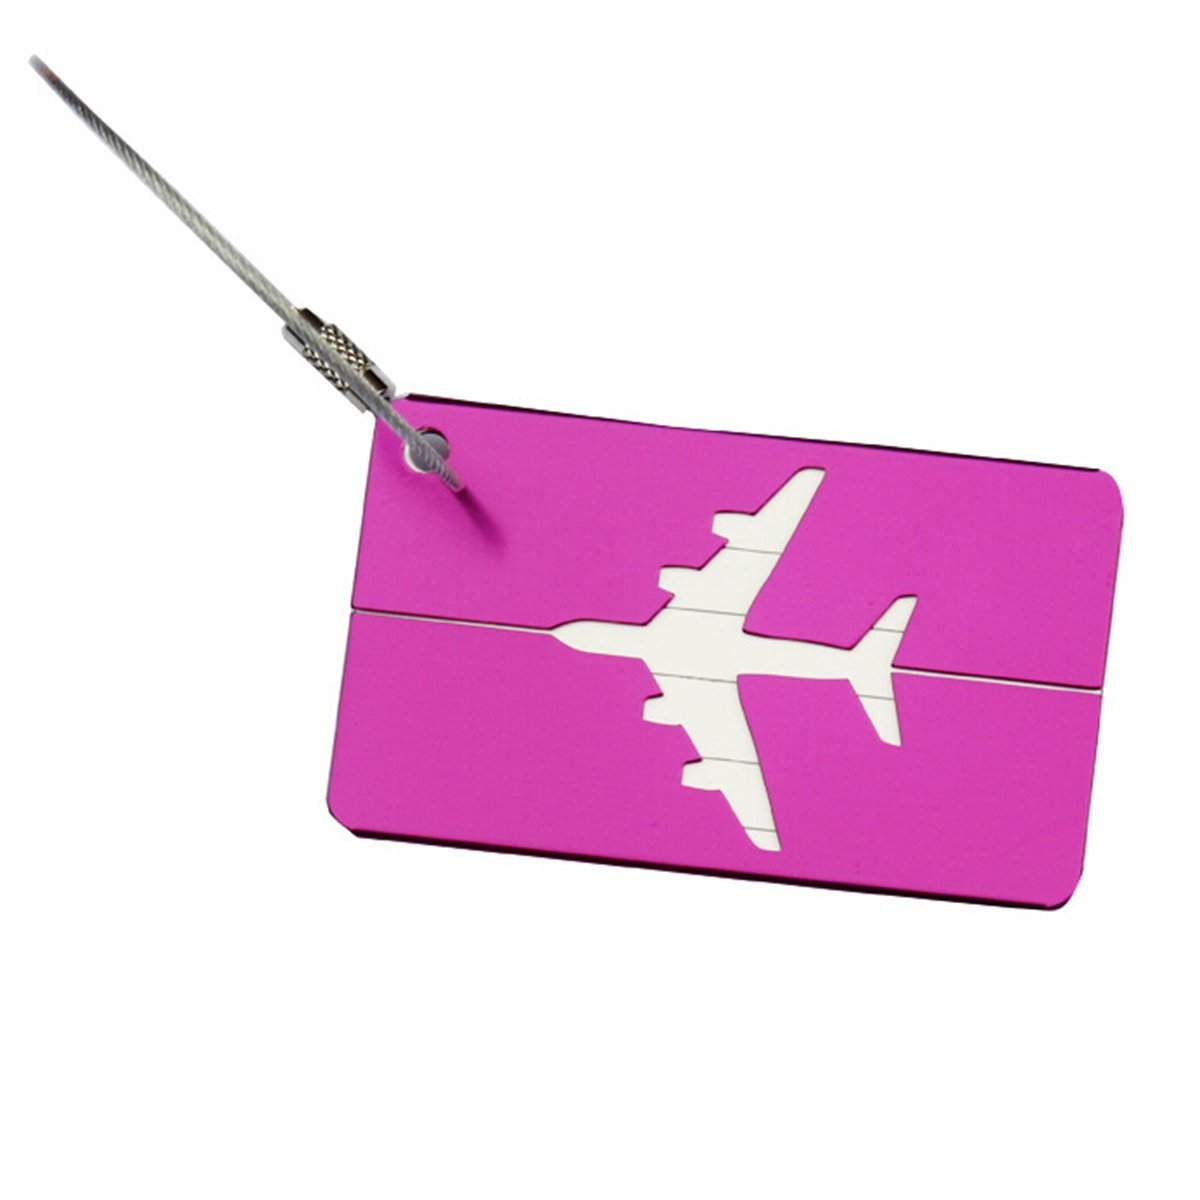 FENICAL Travel Luggage Tag Aluminum Airplane luggage tag Baggage Handbag Tag (Purple)